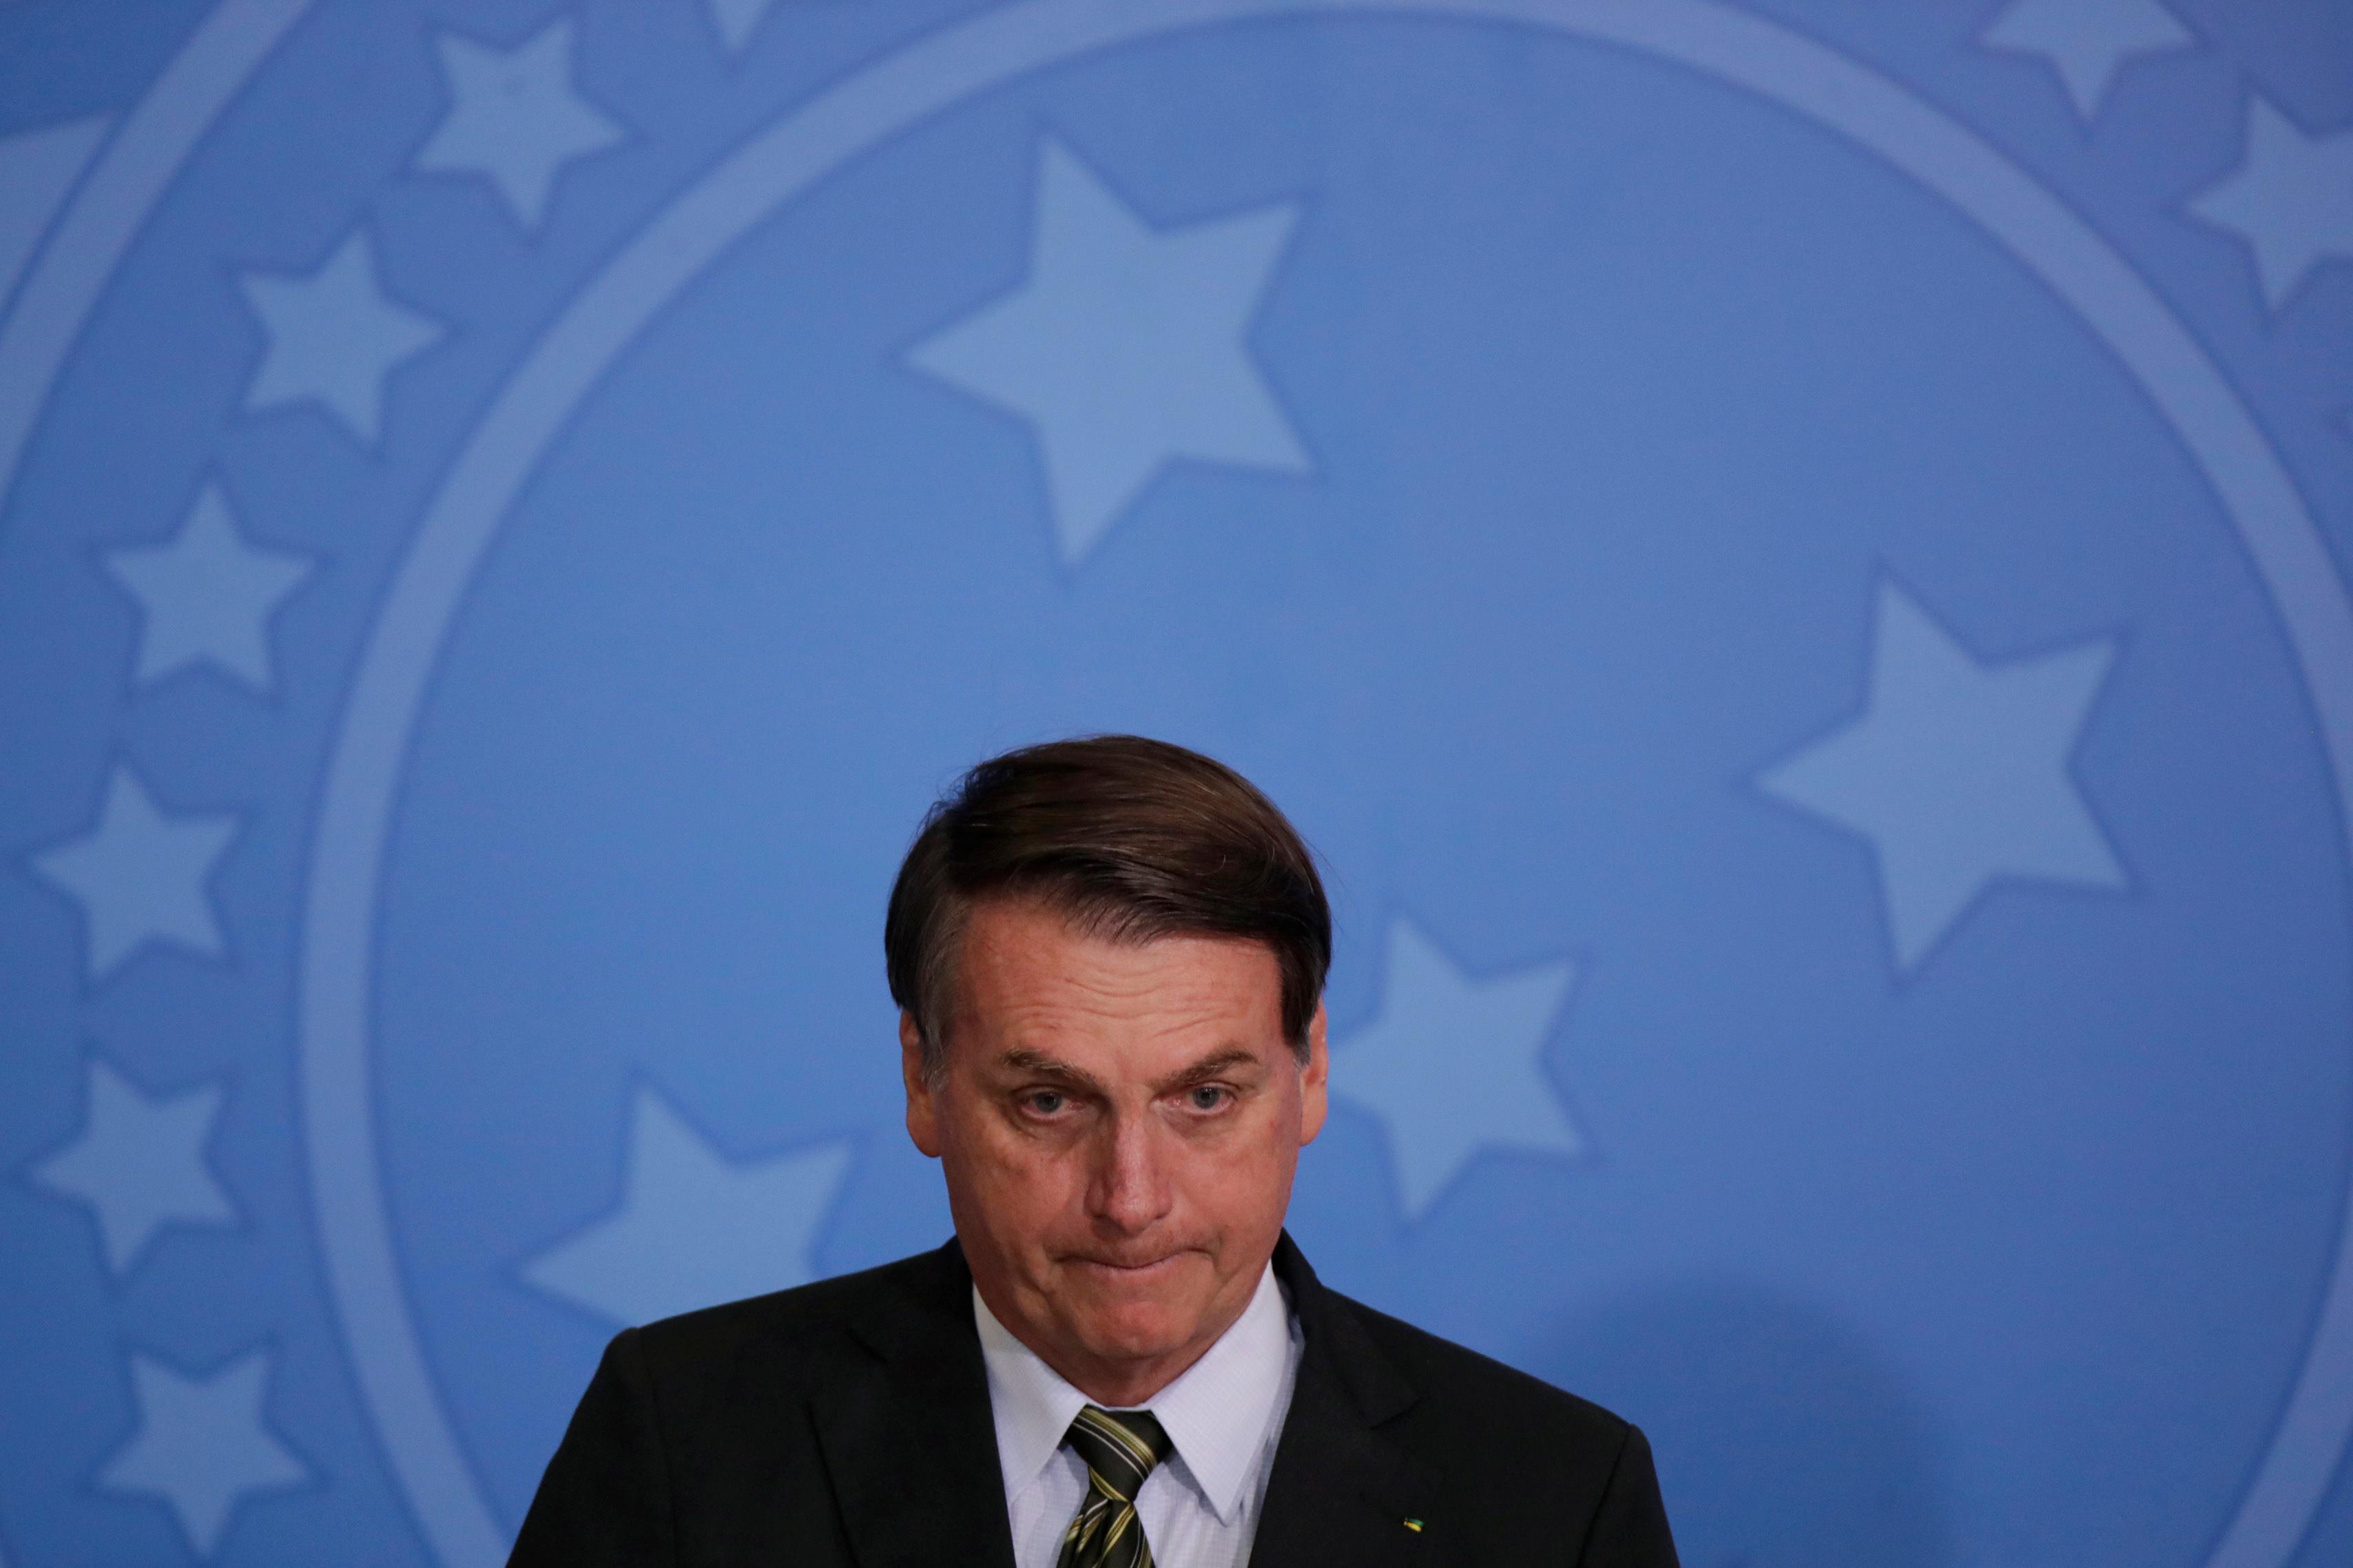 Brazil's Bolsonaro to quit divided PSL party, start new one